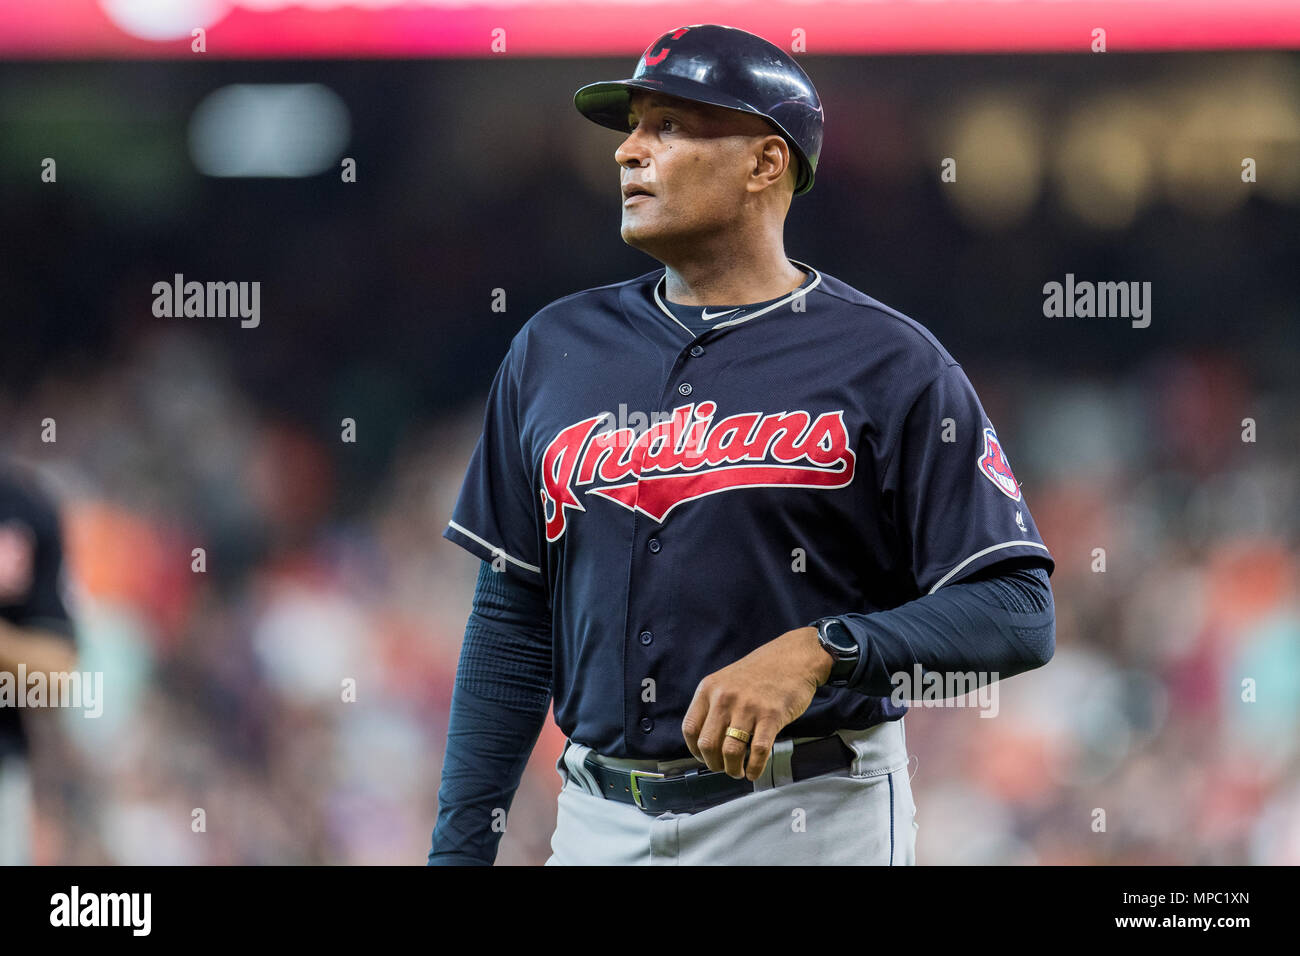 a81b69644c7 May 19, 2018: Cleveland Indians first base coach Sandy Alomar Jr. (15